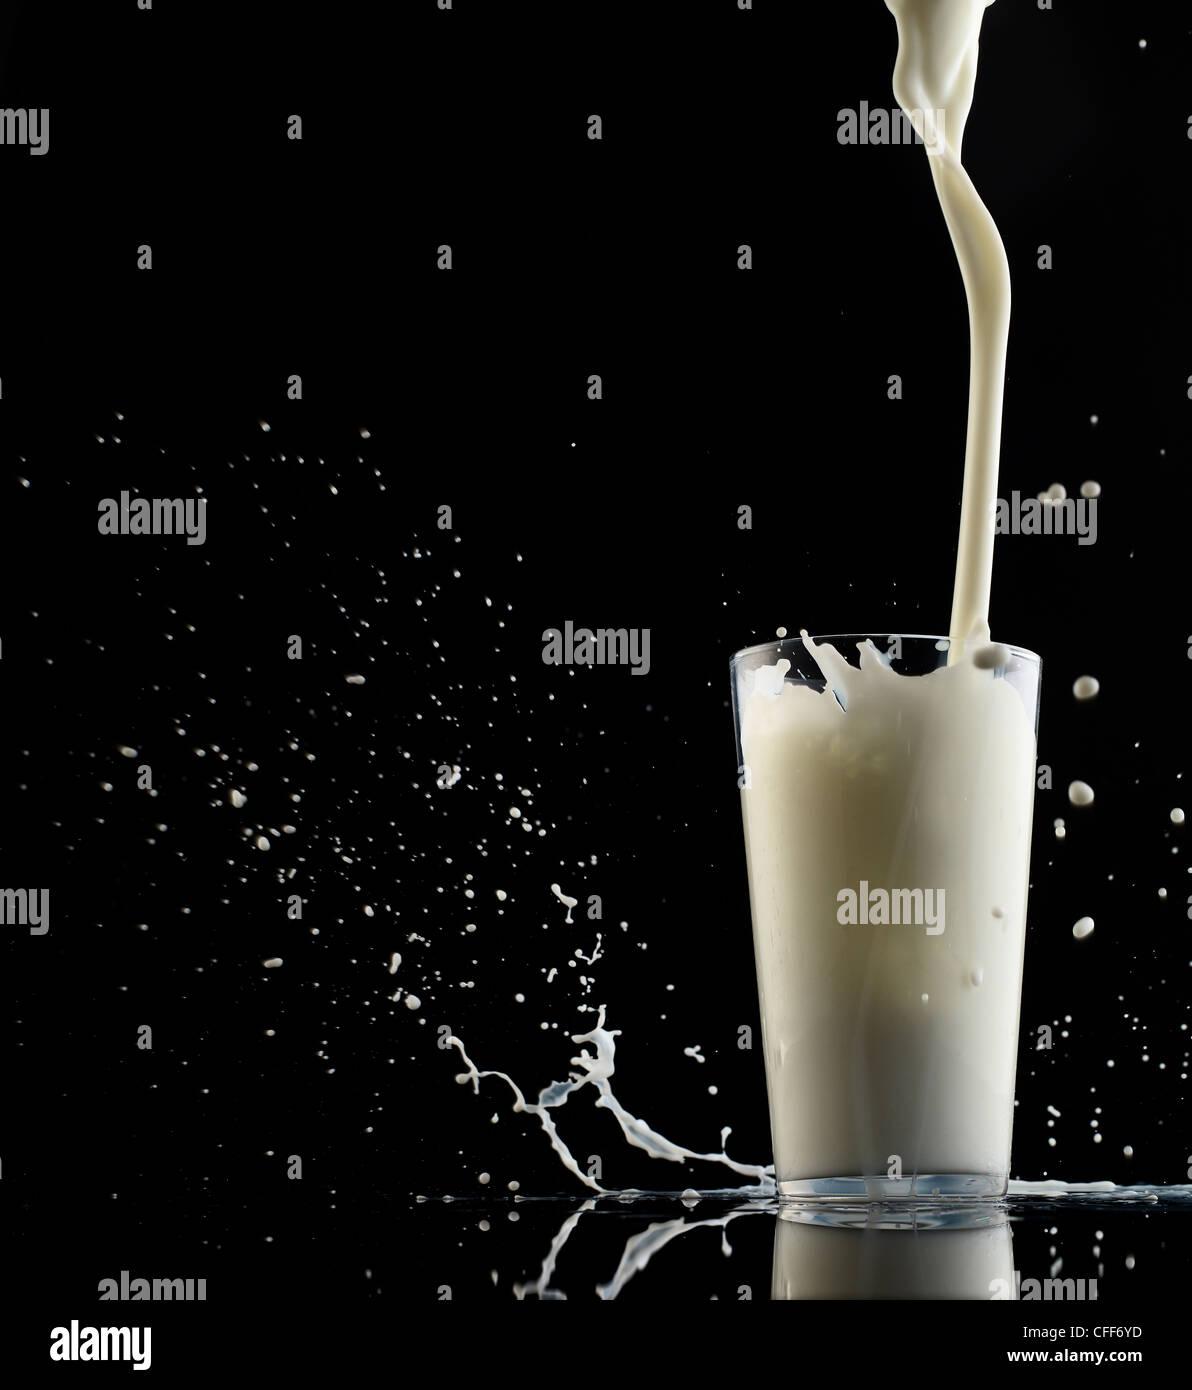 Milk splashing into a glass - Stock Image